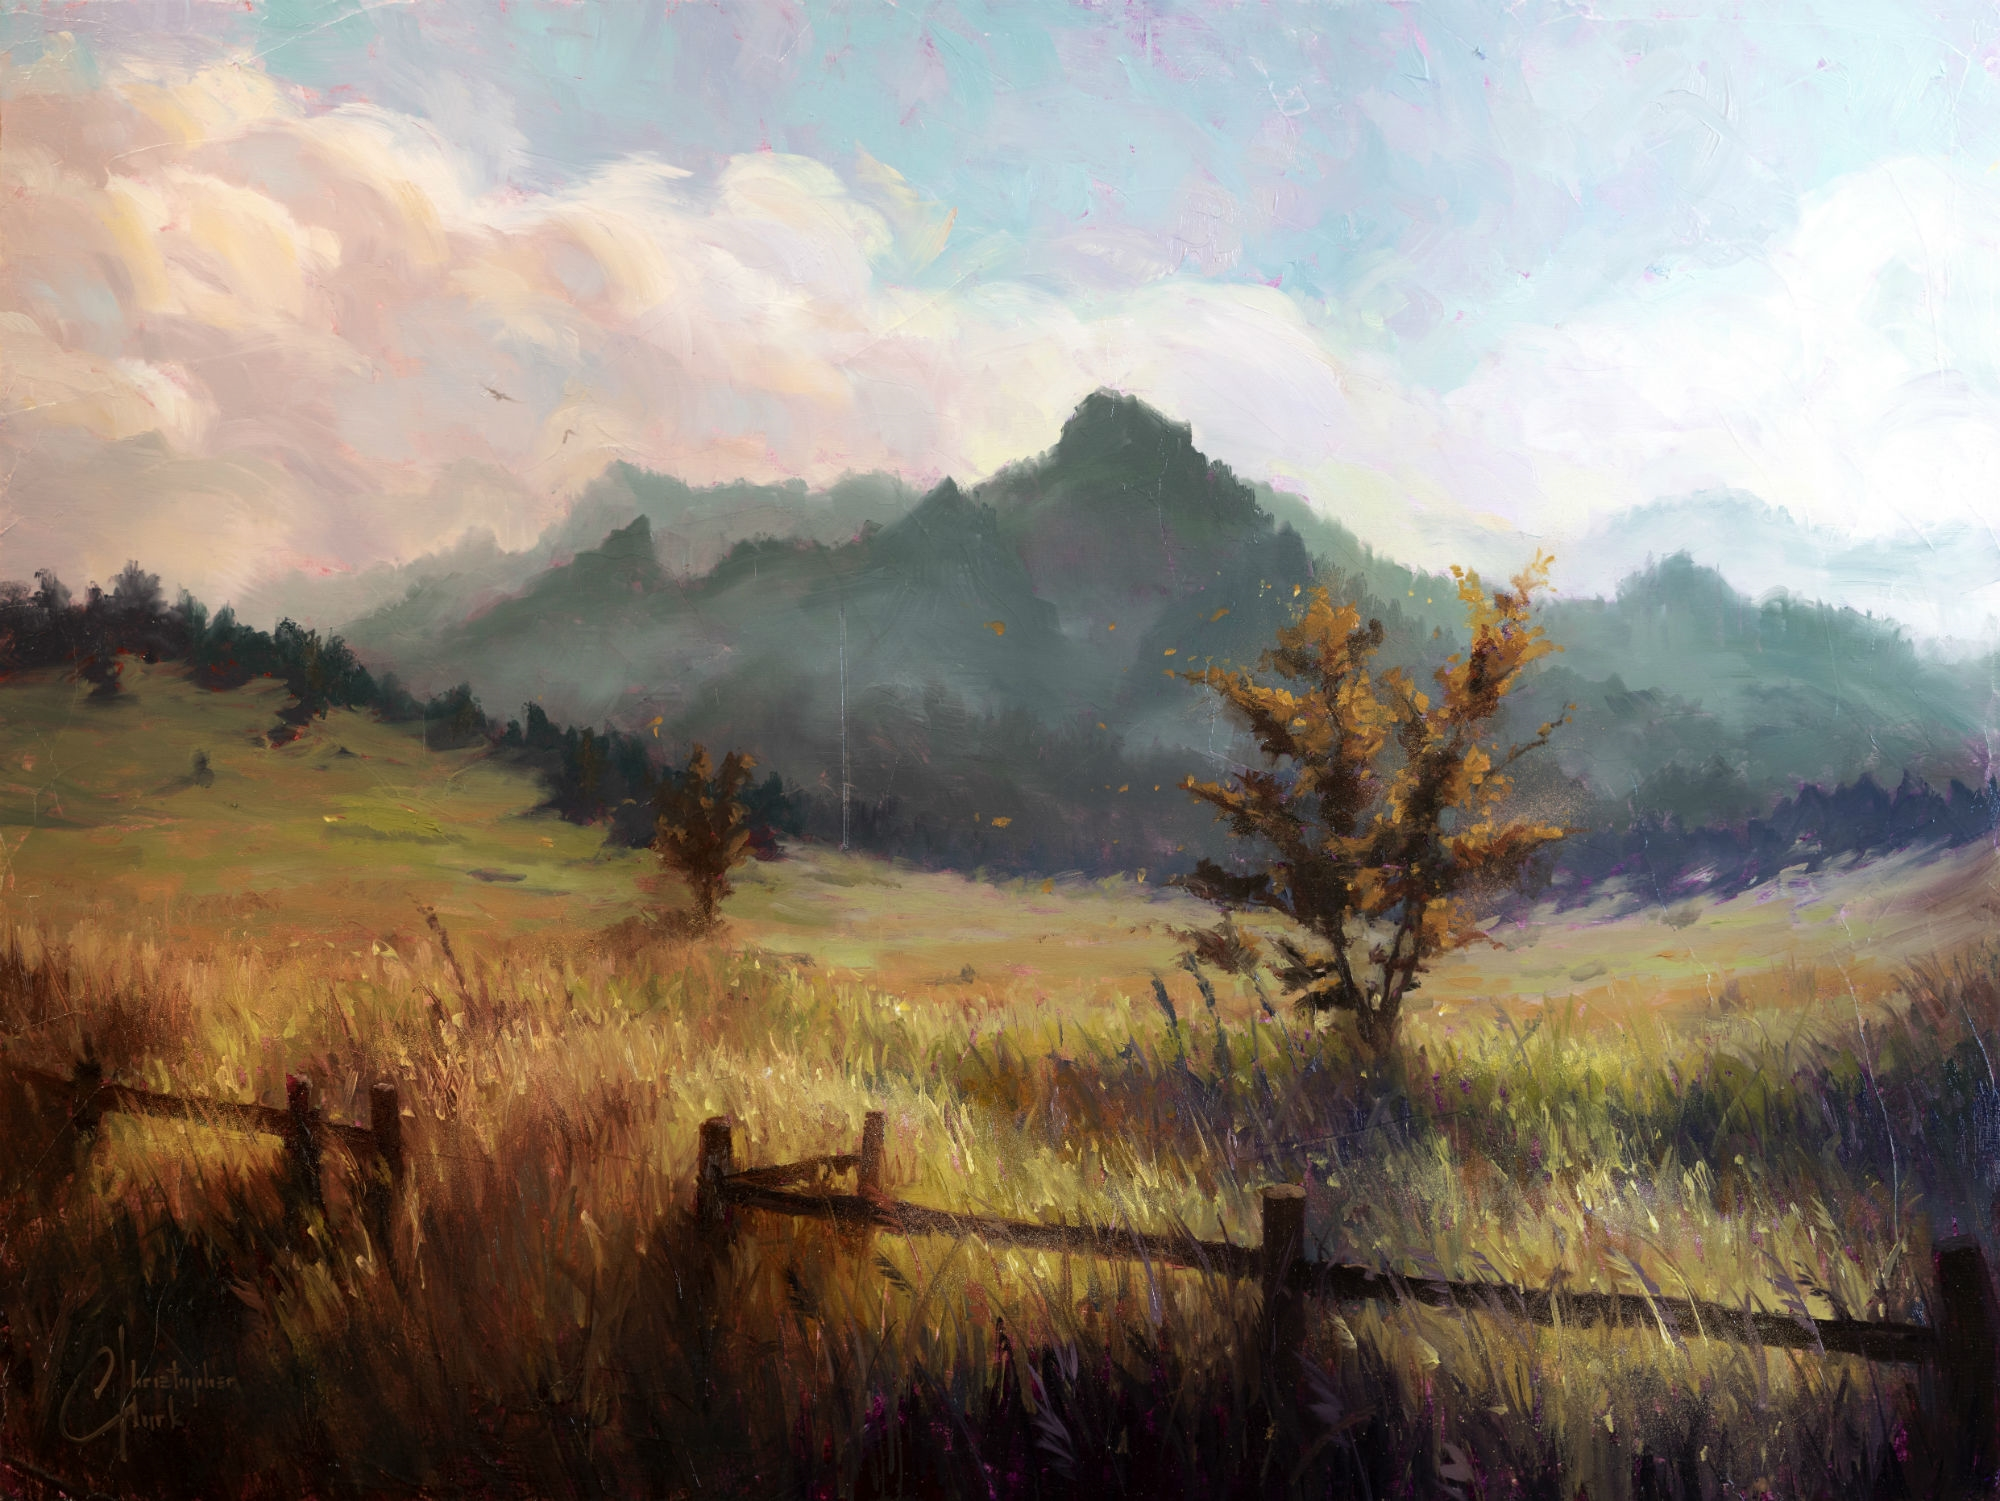 Flatiron Mountains by Christopher Clark